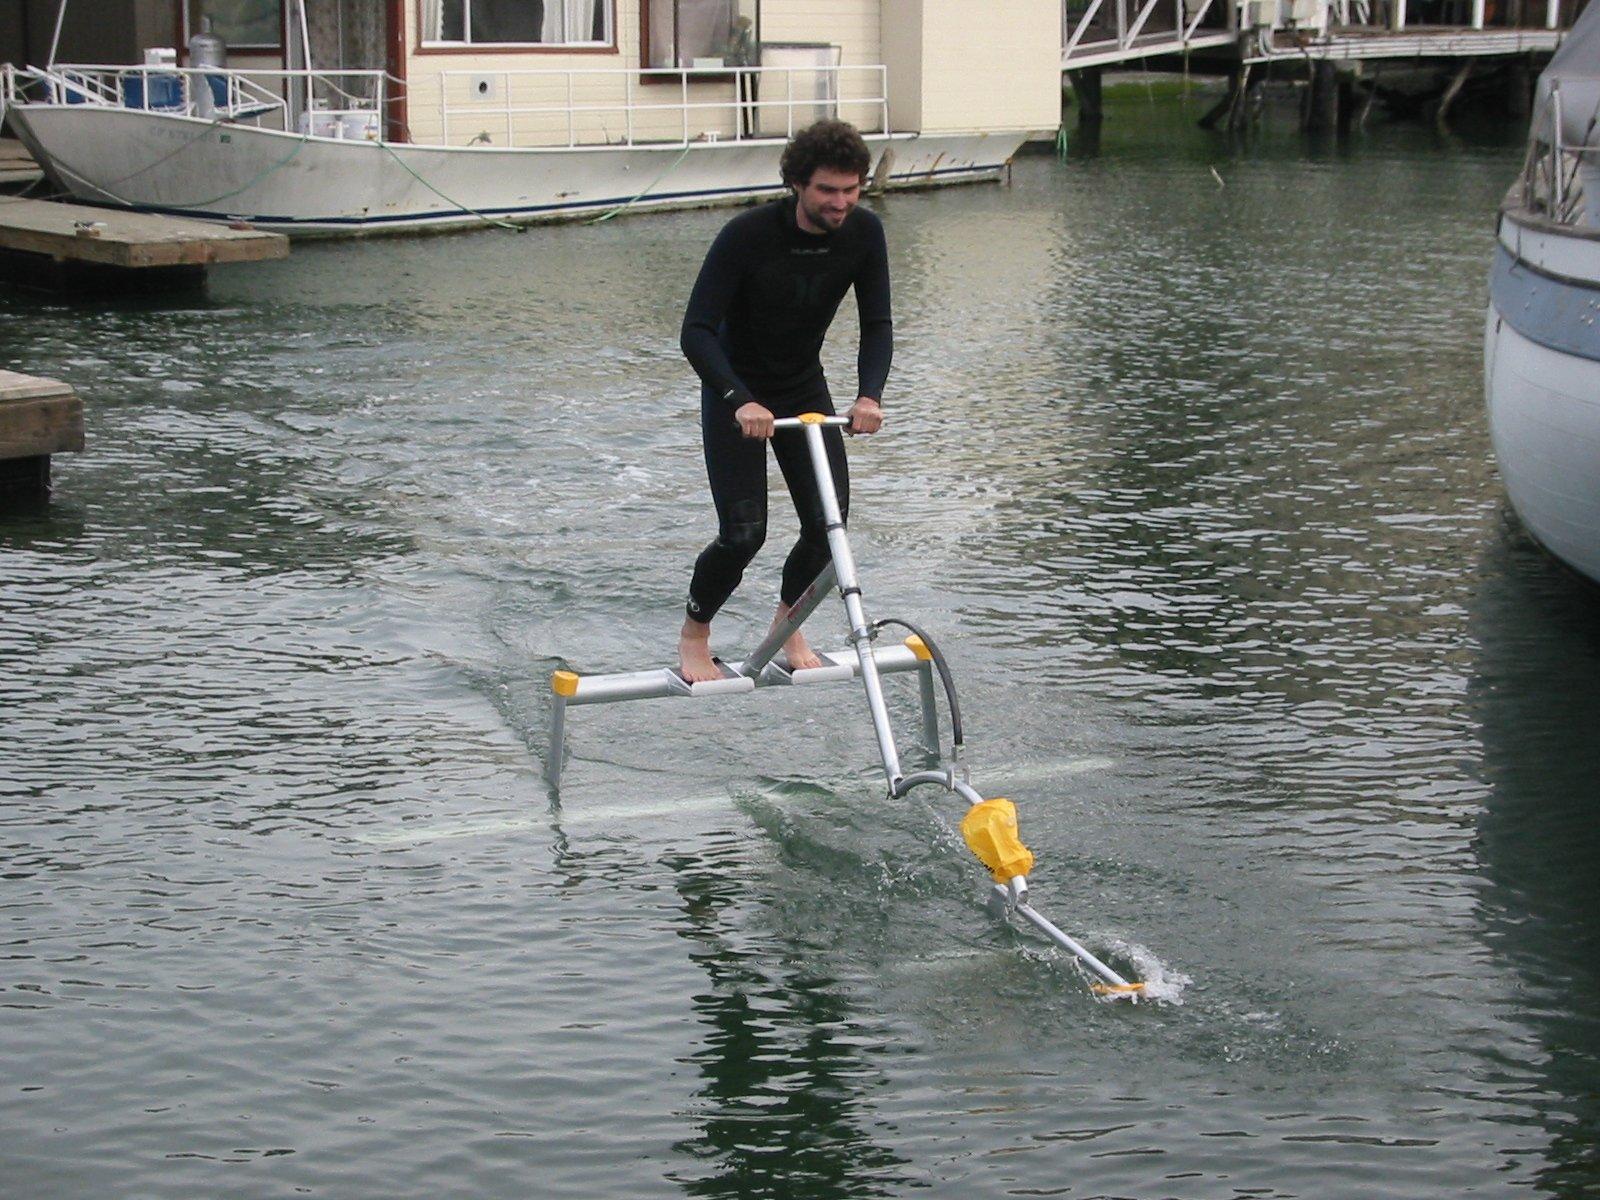 Waterskipper waterbird aquabike sea Scooter